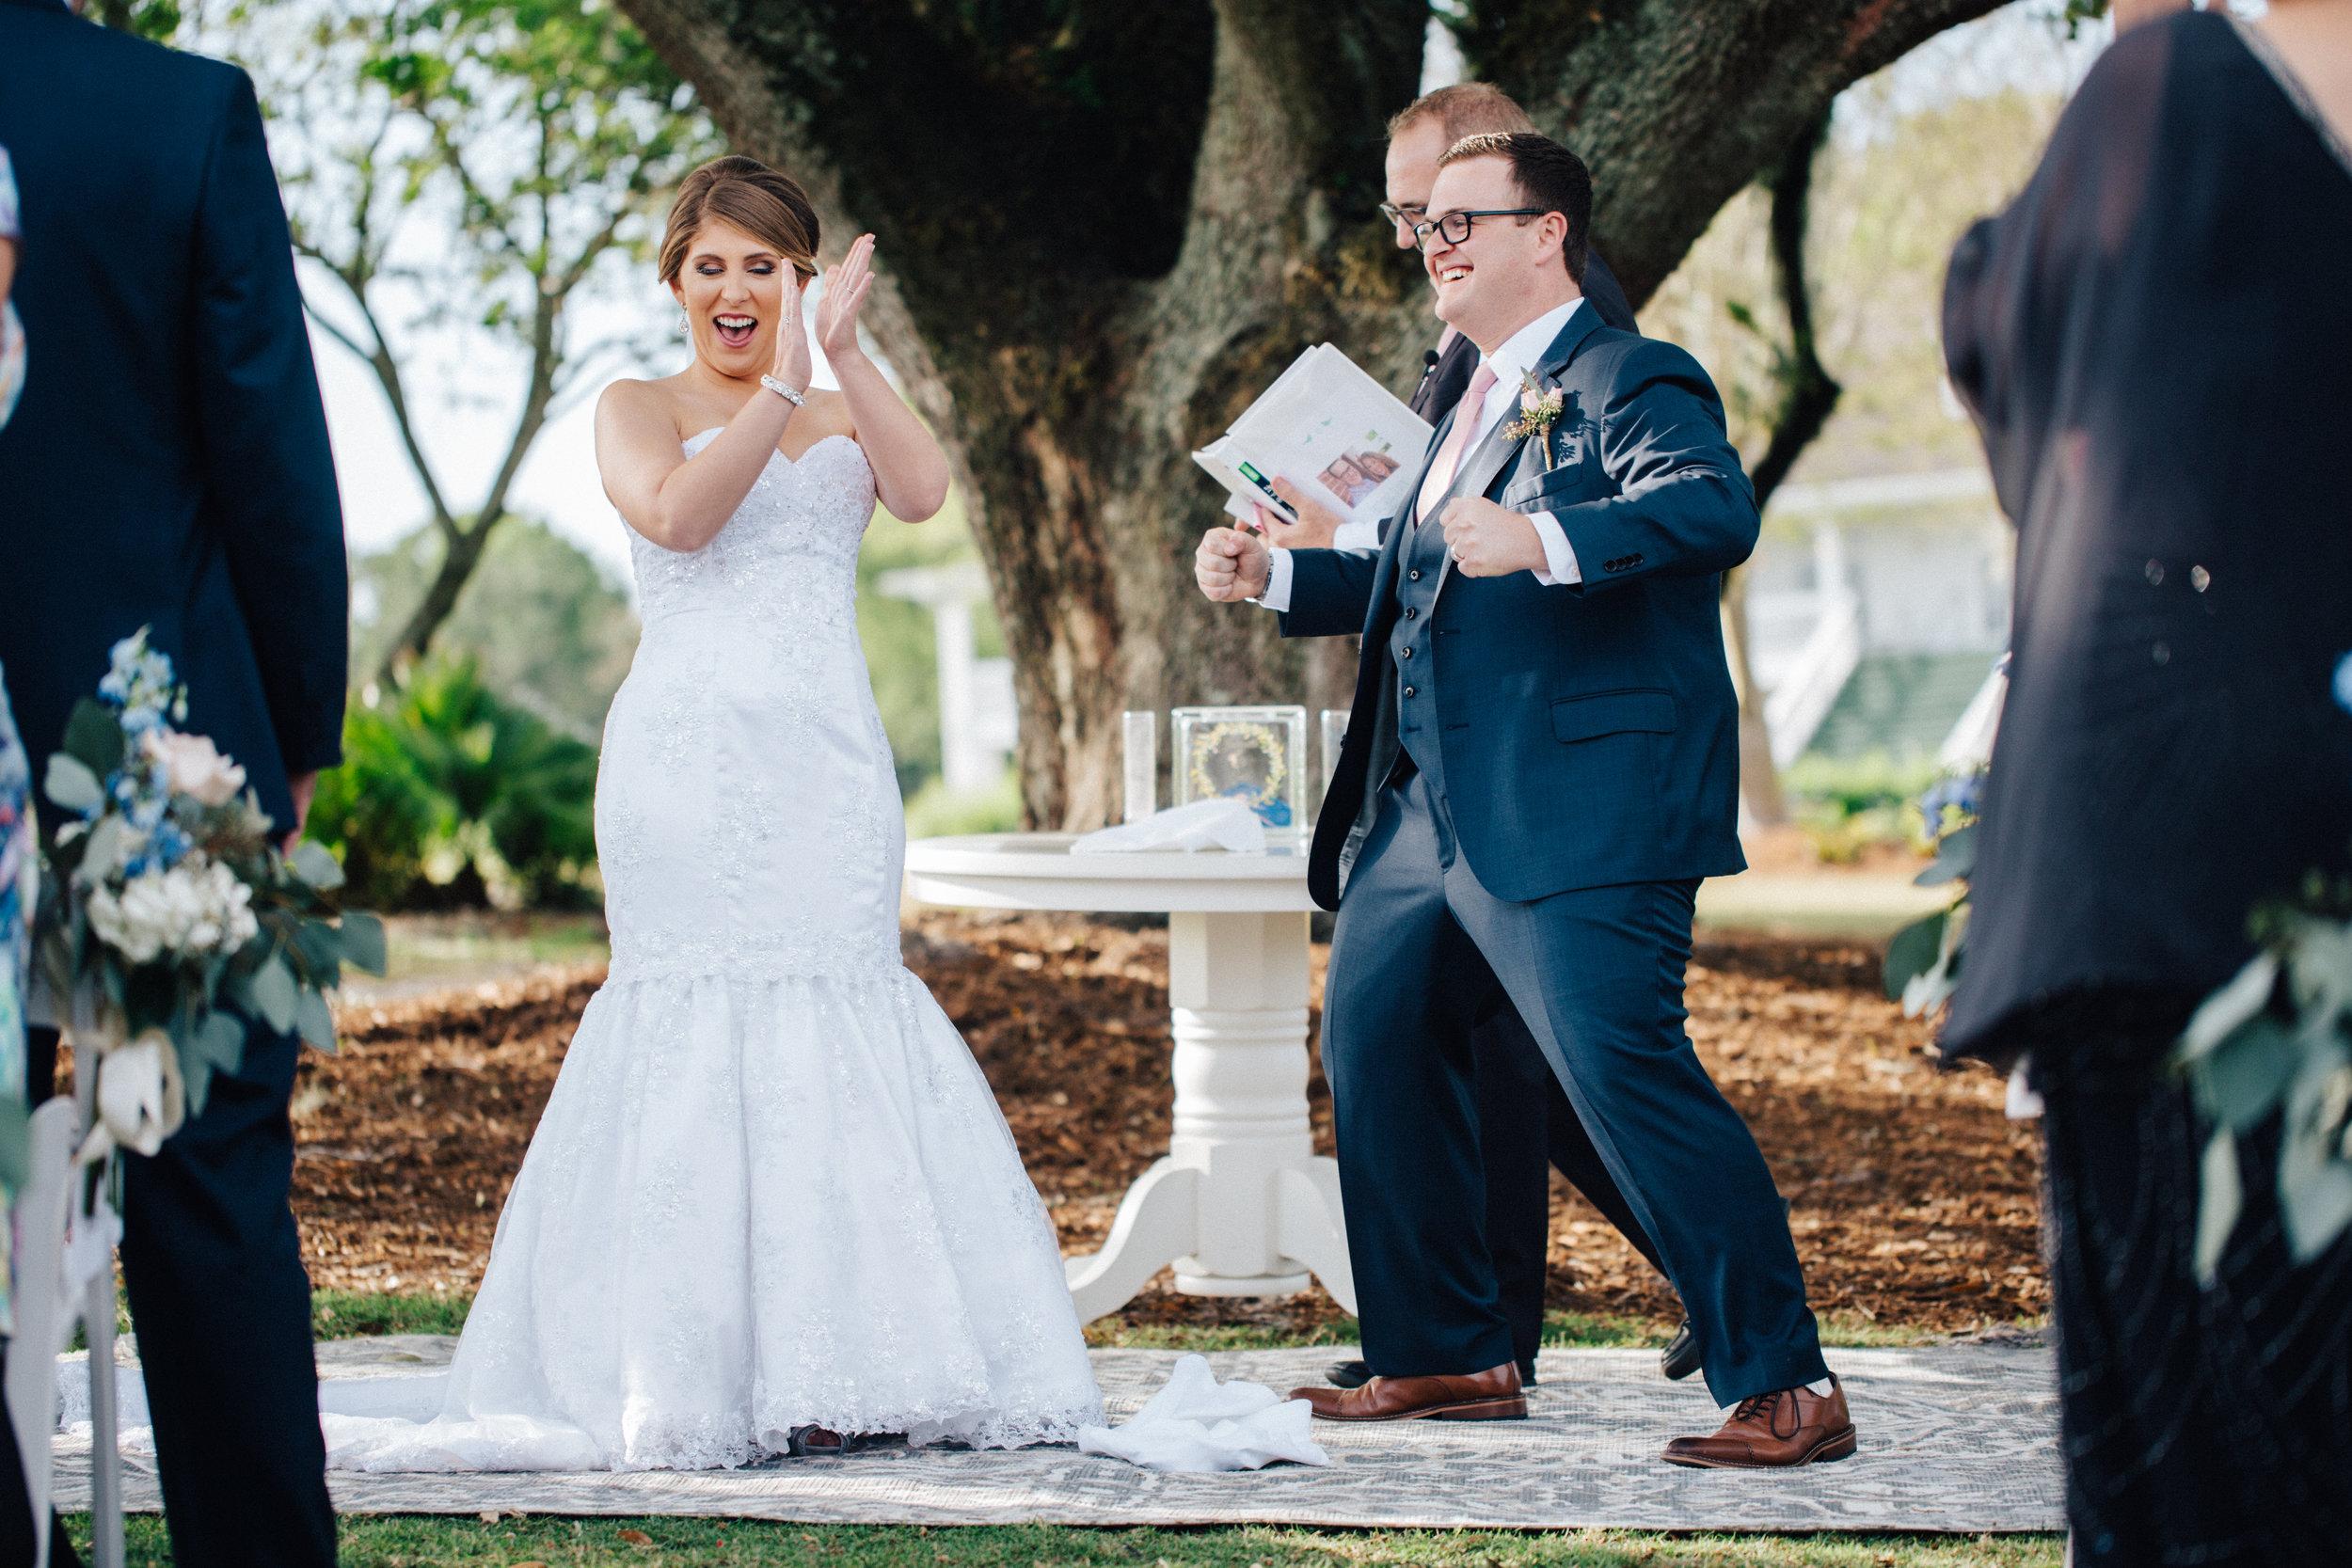 Tuskawilla Country Club Wedding Photographer-69.jpg